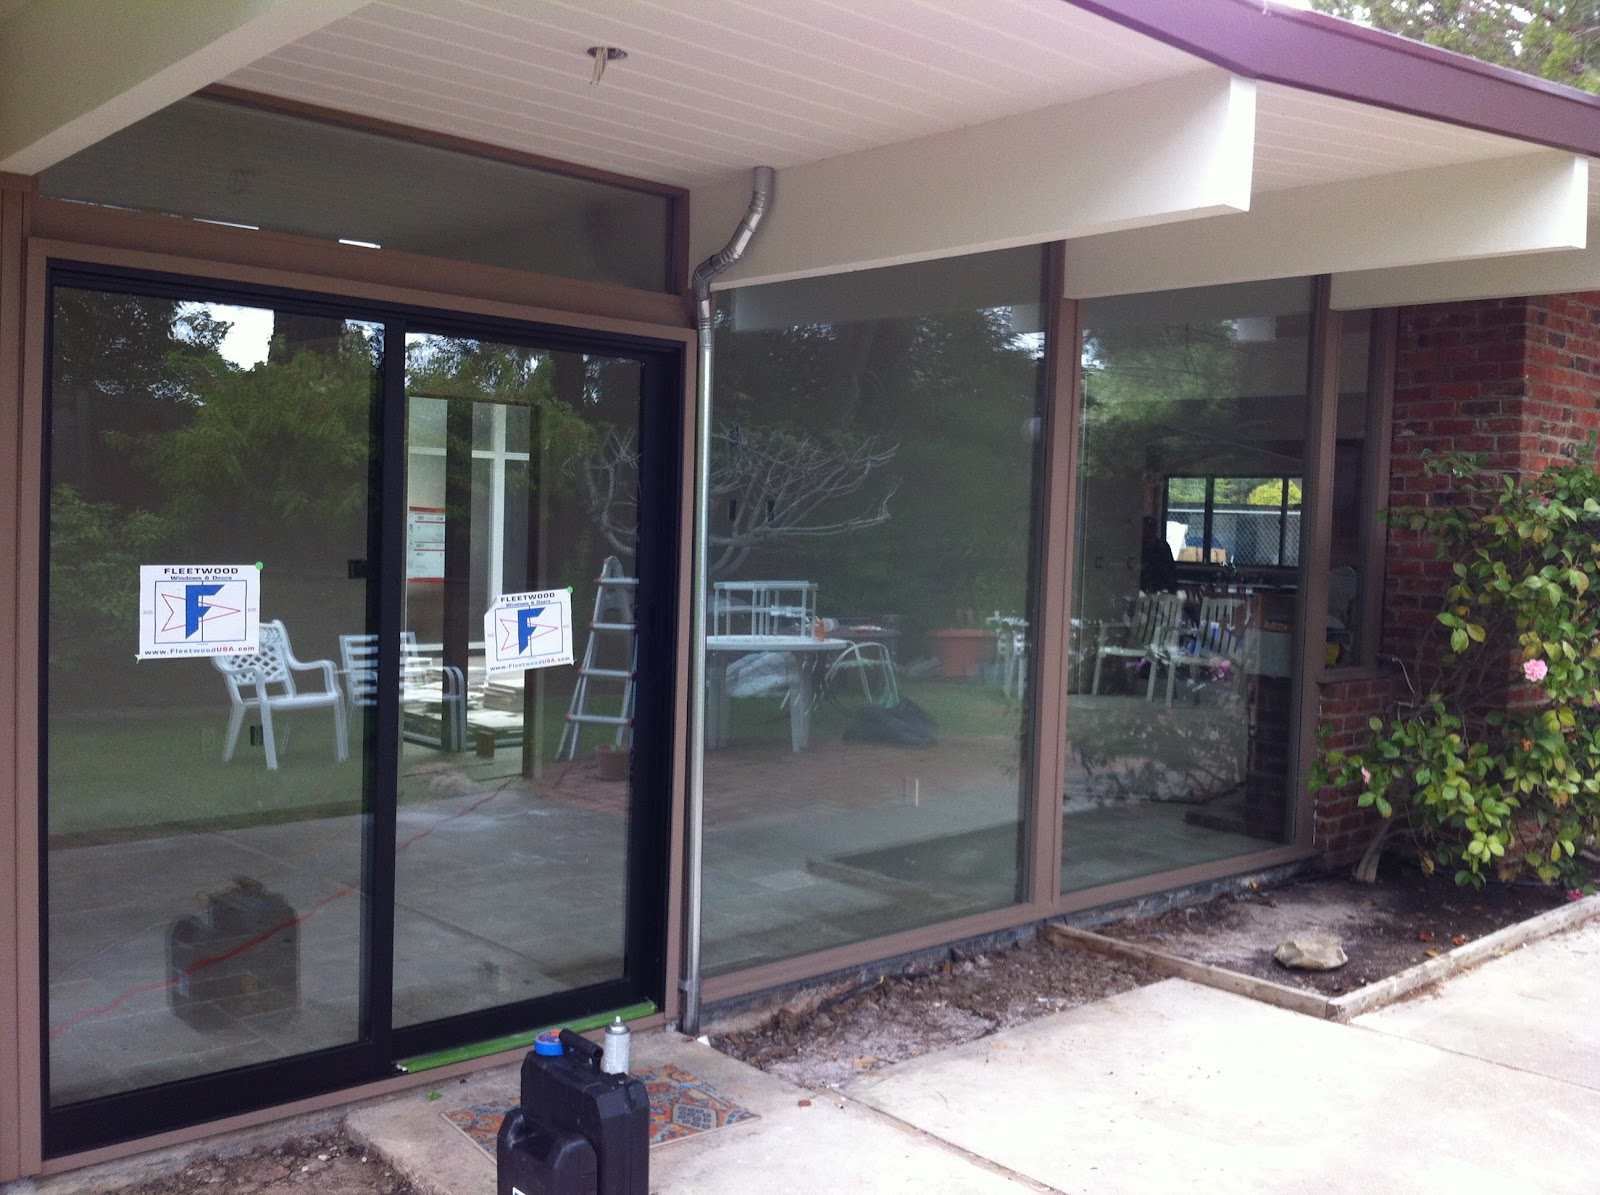 Aluminum Window Fleetwood Aluminum Window. Laundry Sorter Ikea. Hog Panel Fencing. Quartz Kitchen Countertops. Palladium Window. Virginia Tile. White Kitchen Cabinets With Granite Countertops. Kitchen Experts. Open Concept Kitchen